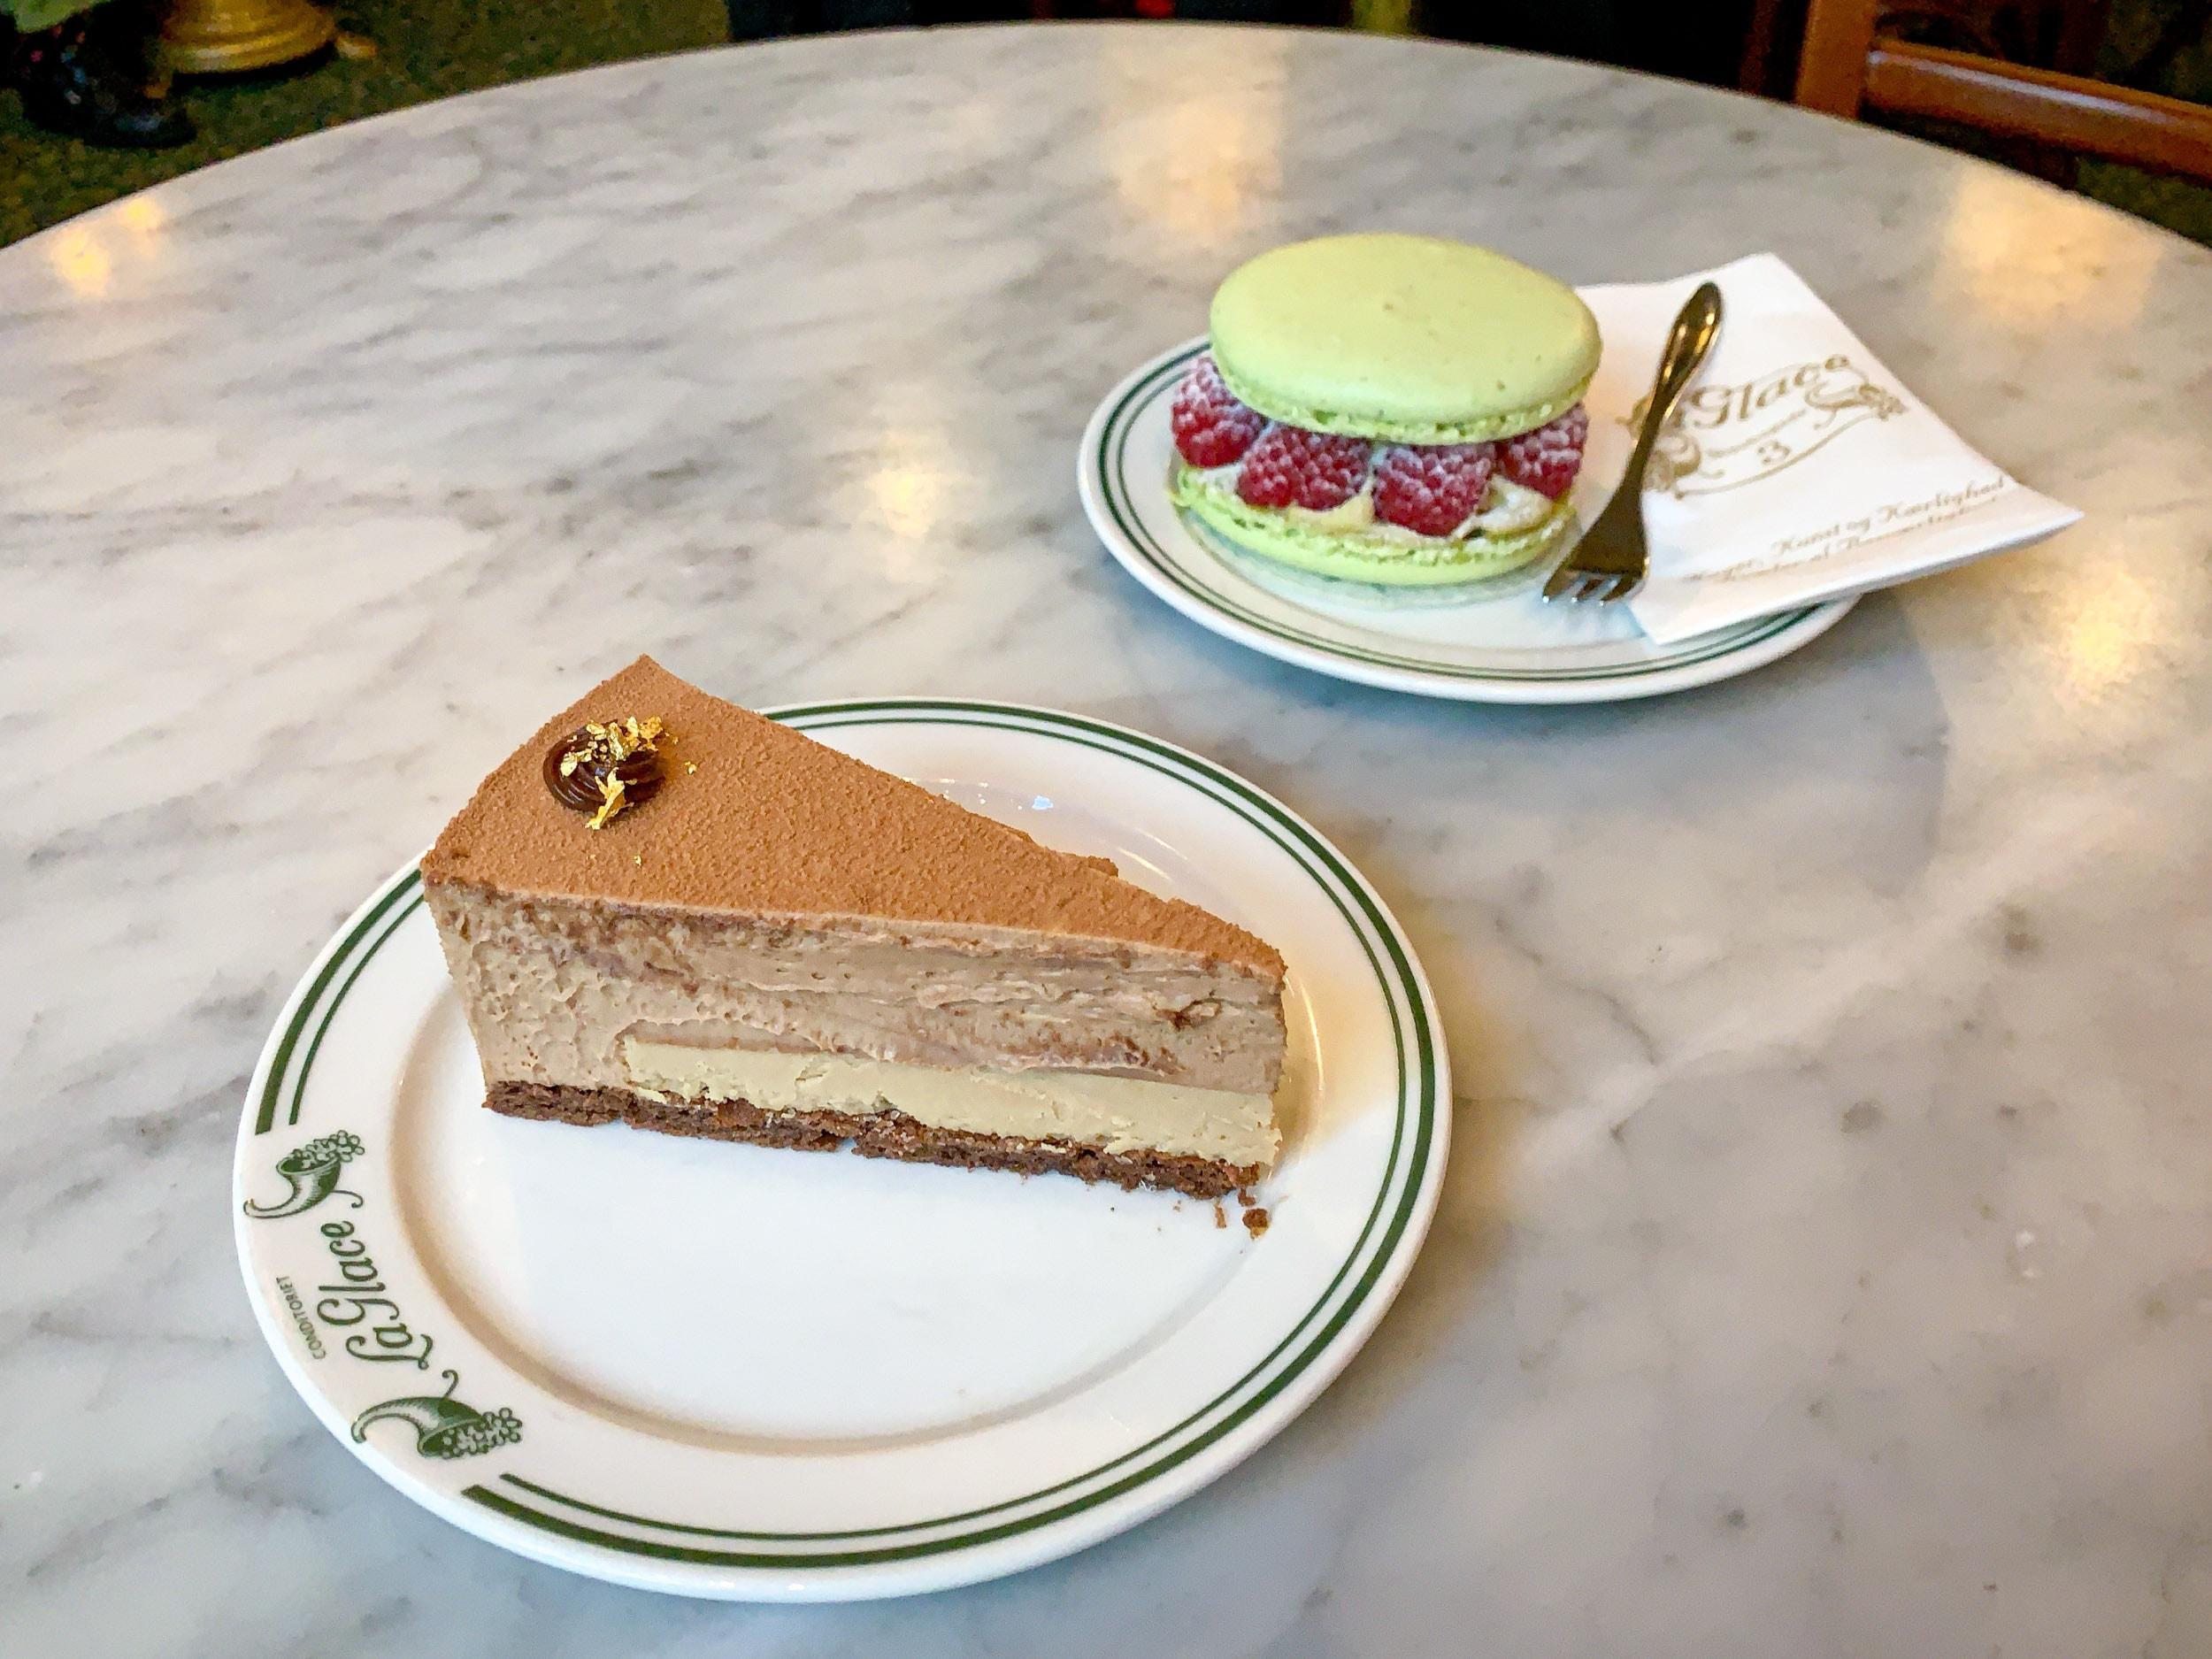 Caramel mousse cake and pistachio macarons